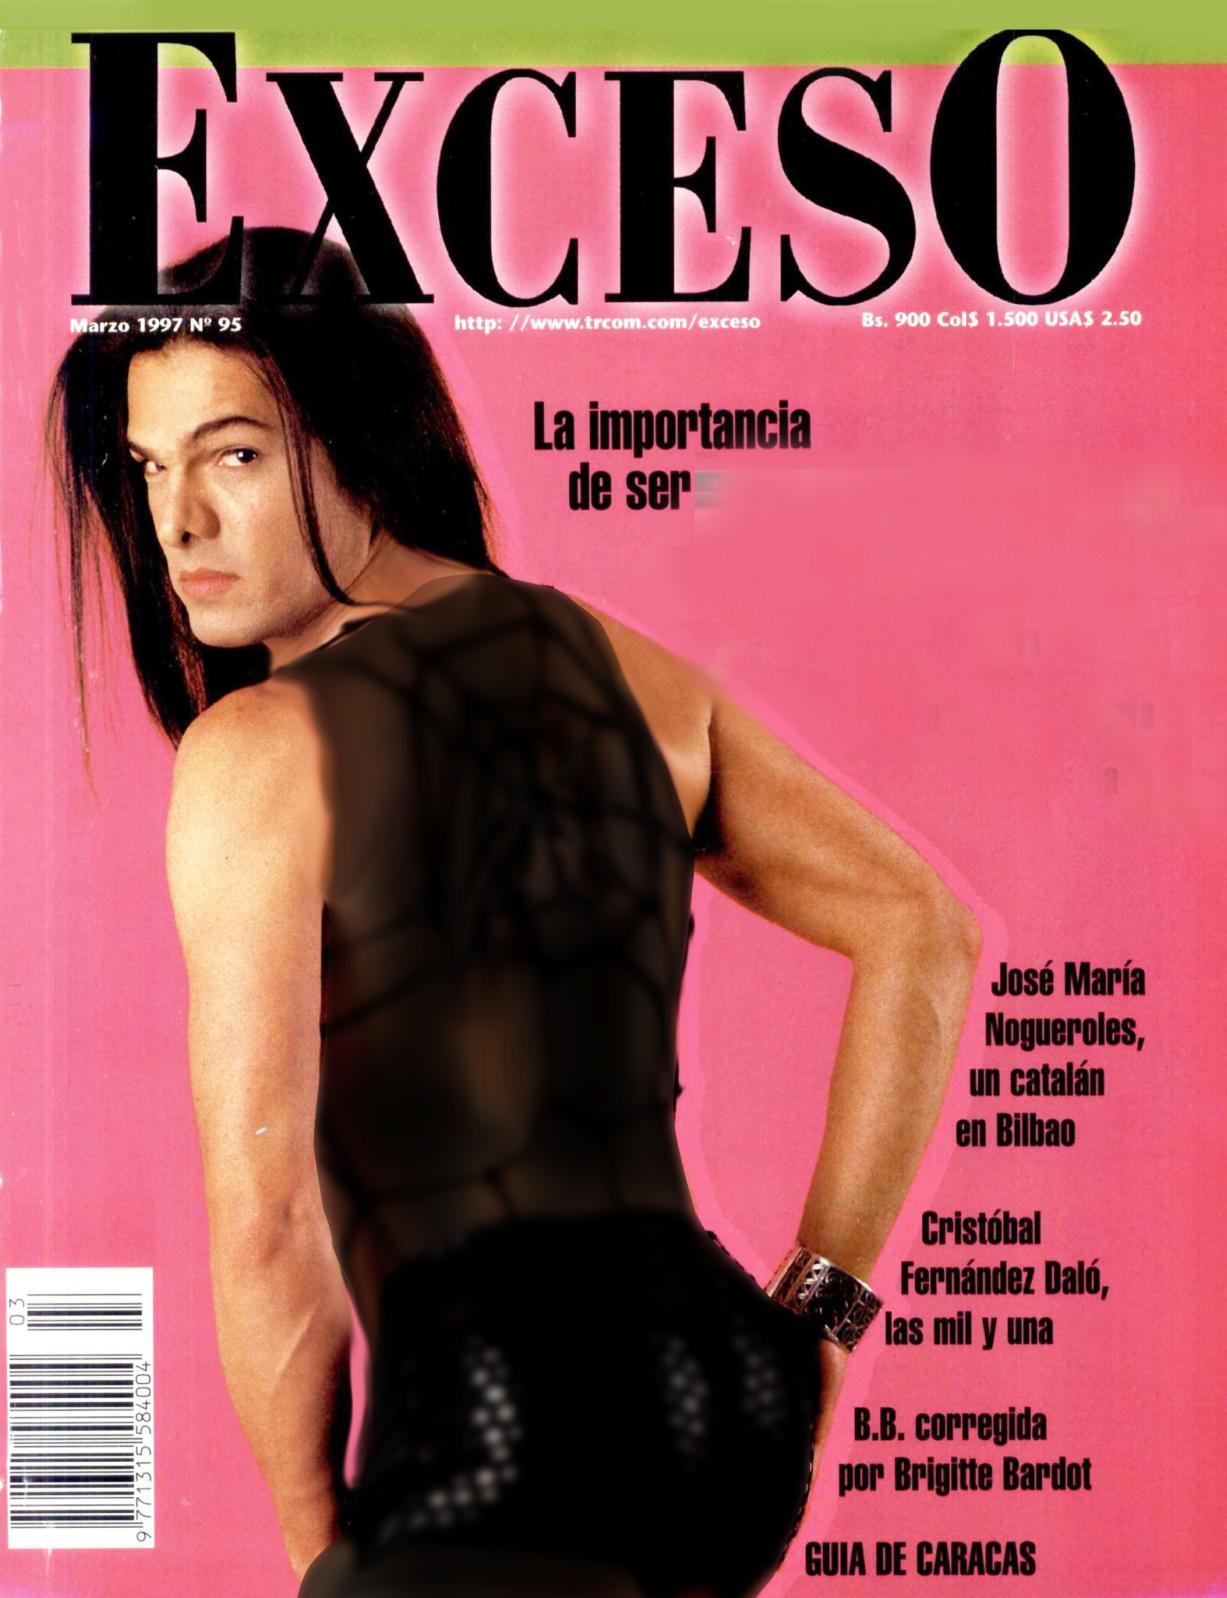 Conocer Chicas Barquisimeto Sexo - 941178